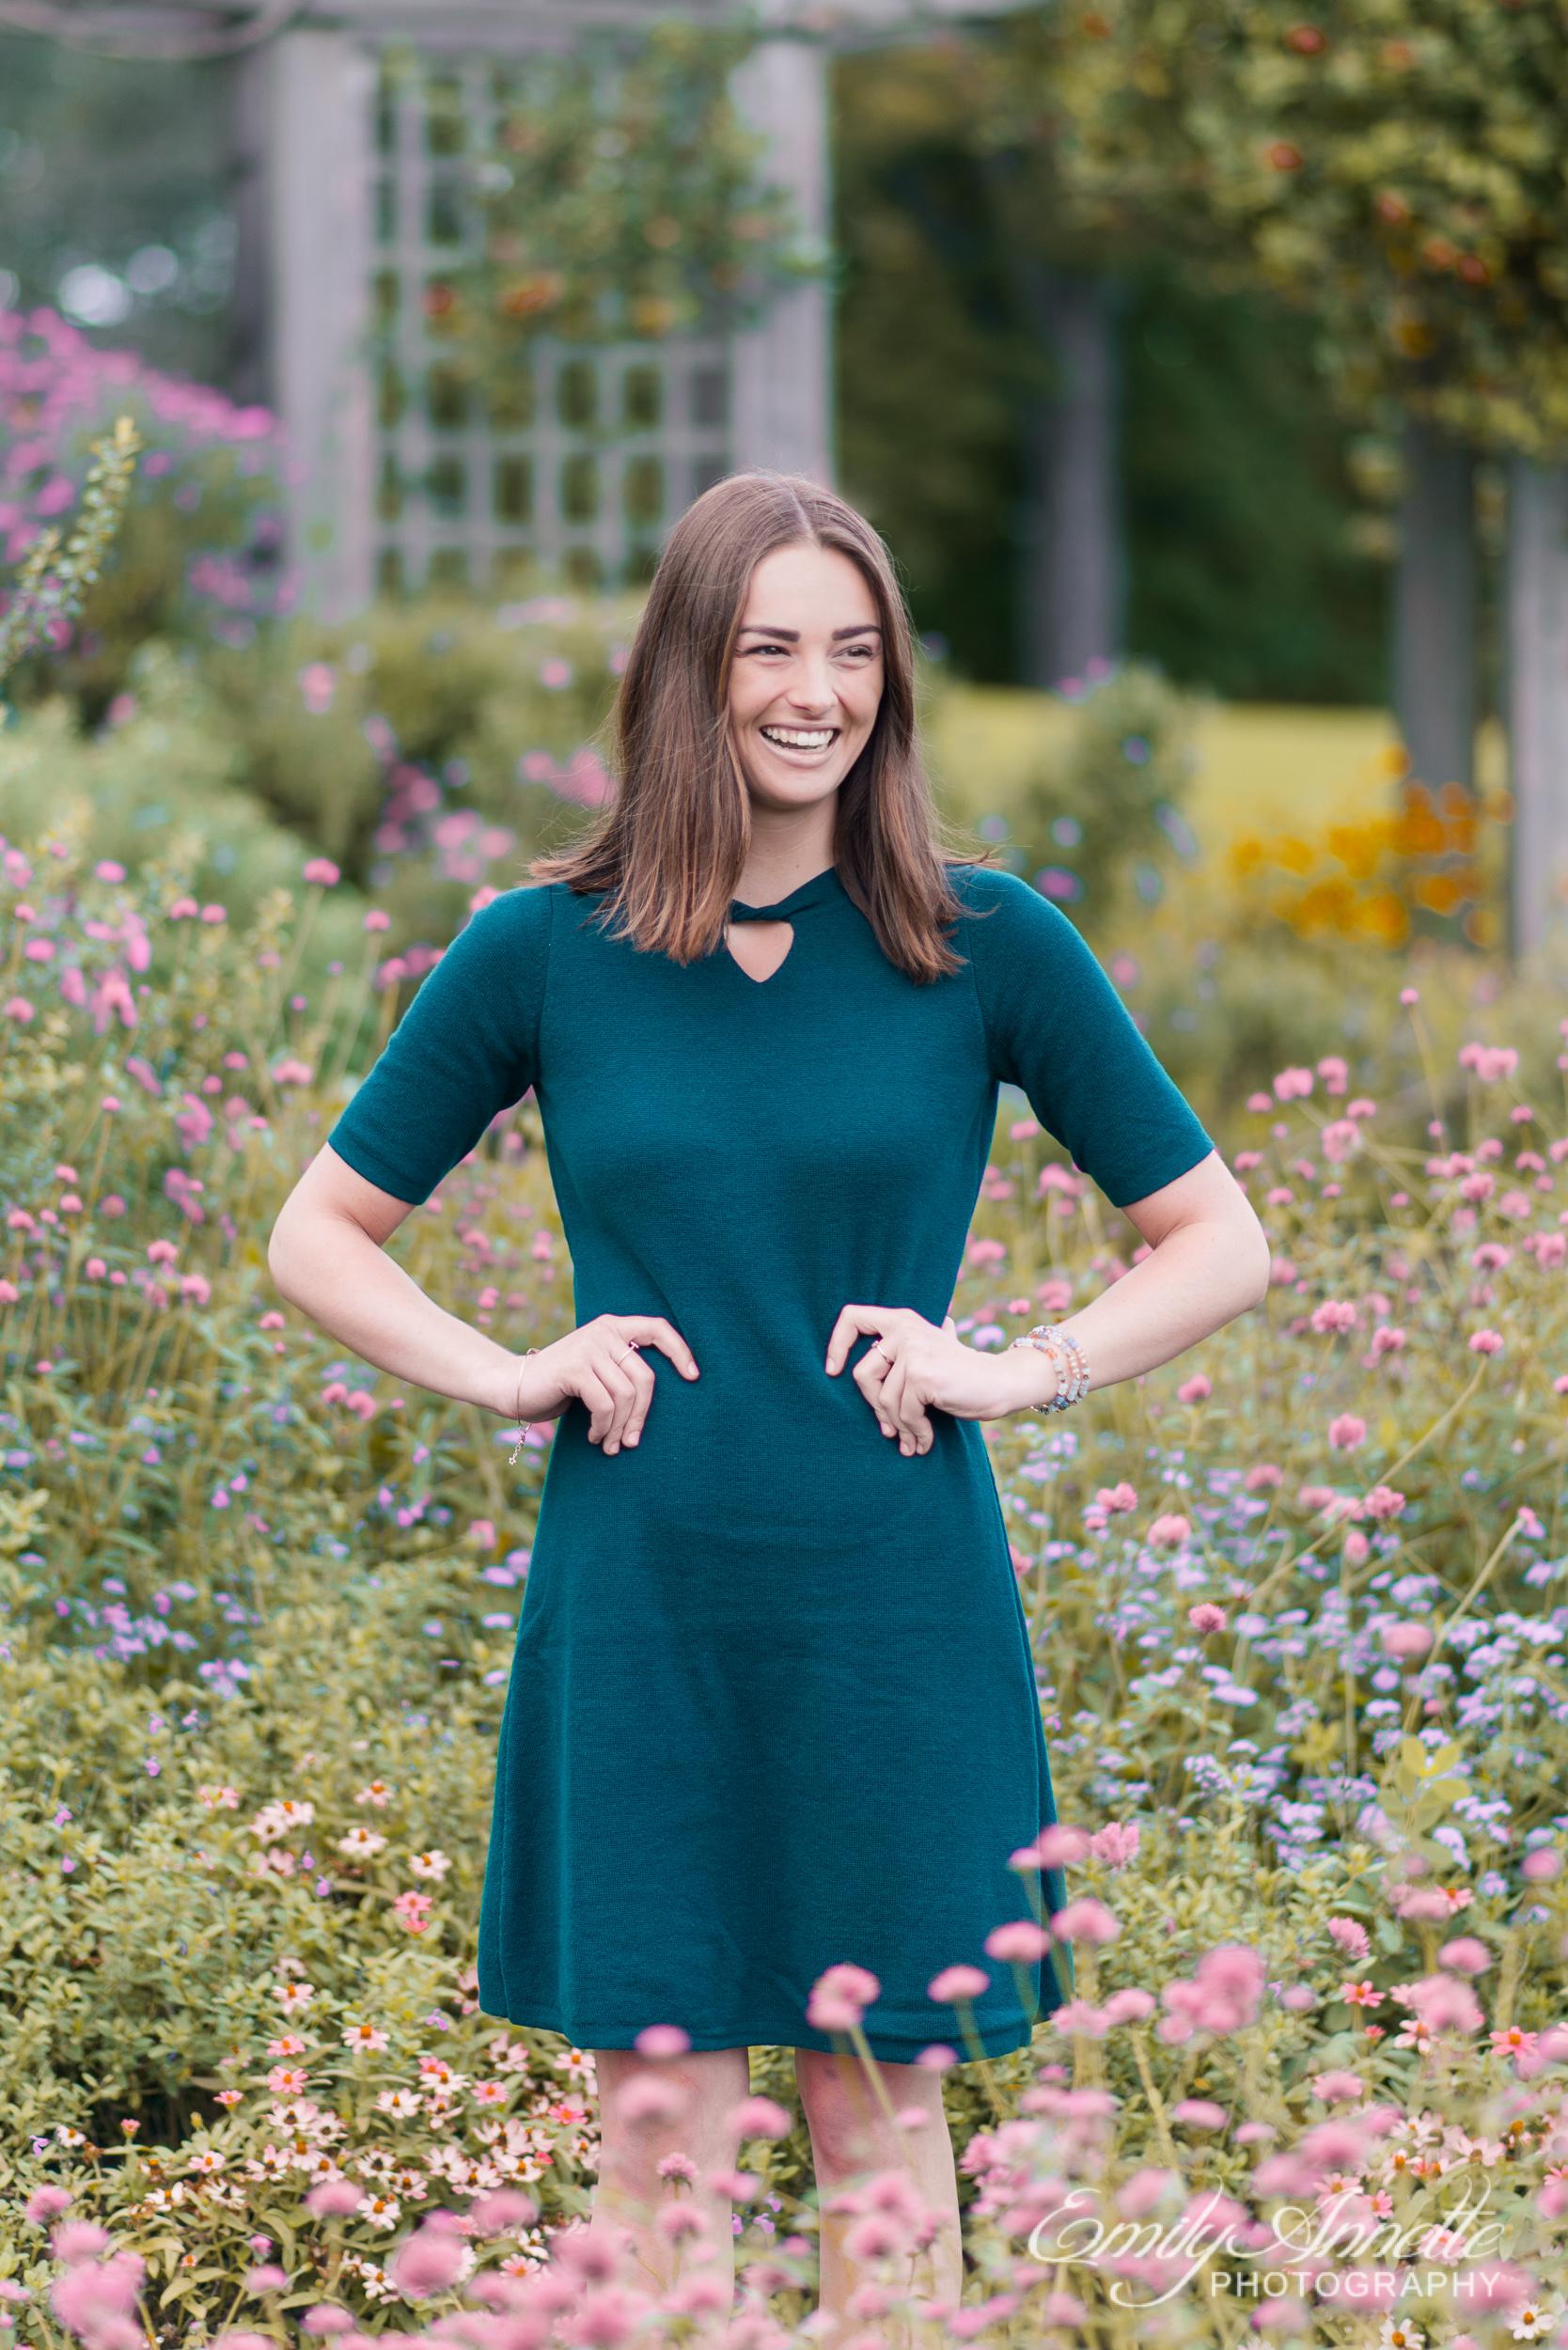 A young woman stands in a lush garden in Green Spring Gardens in Fairfax, Virginia